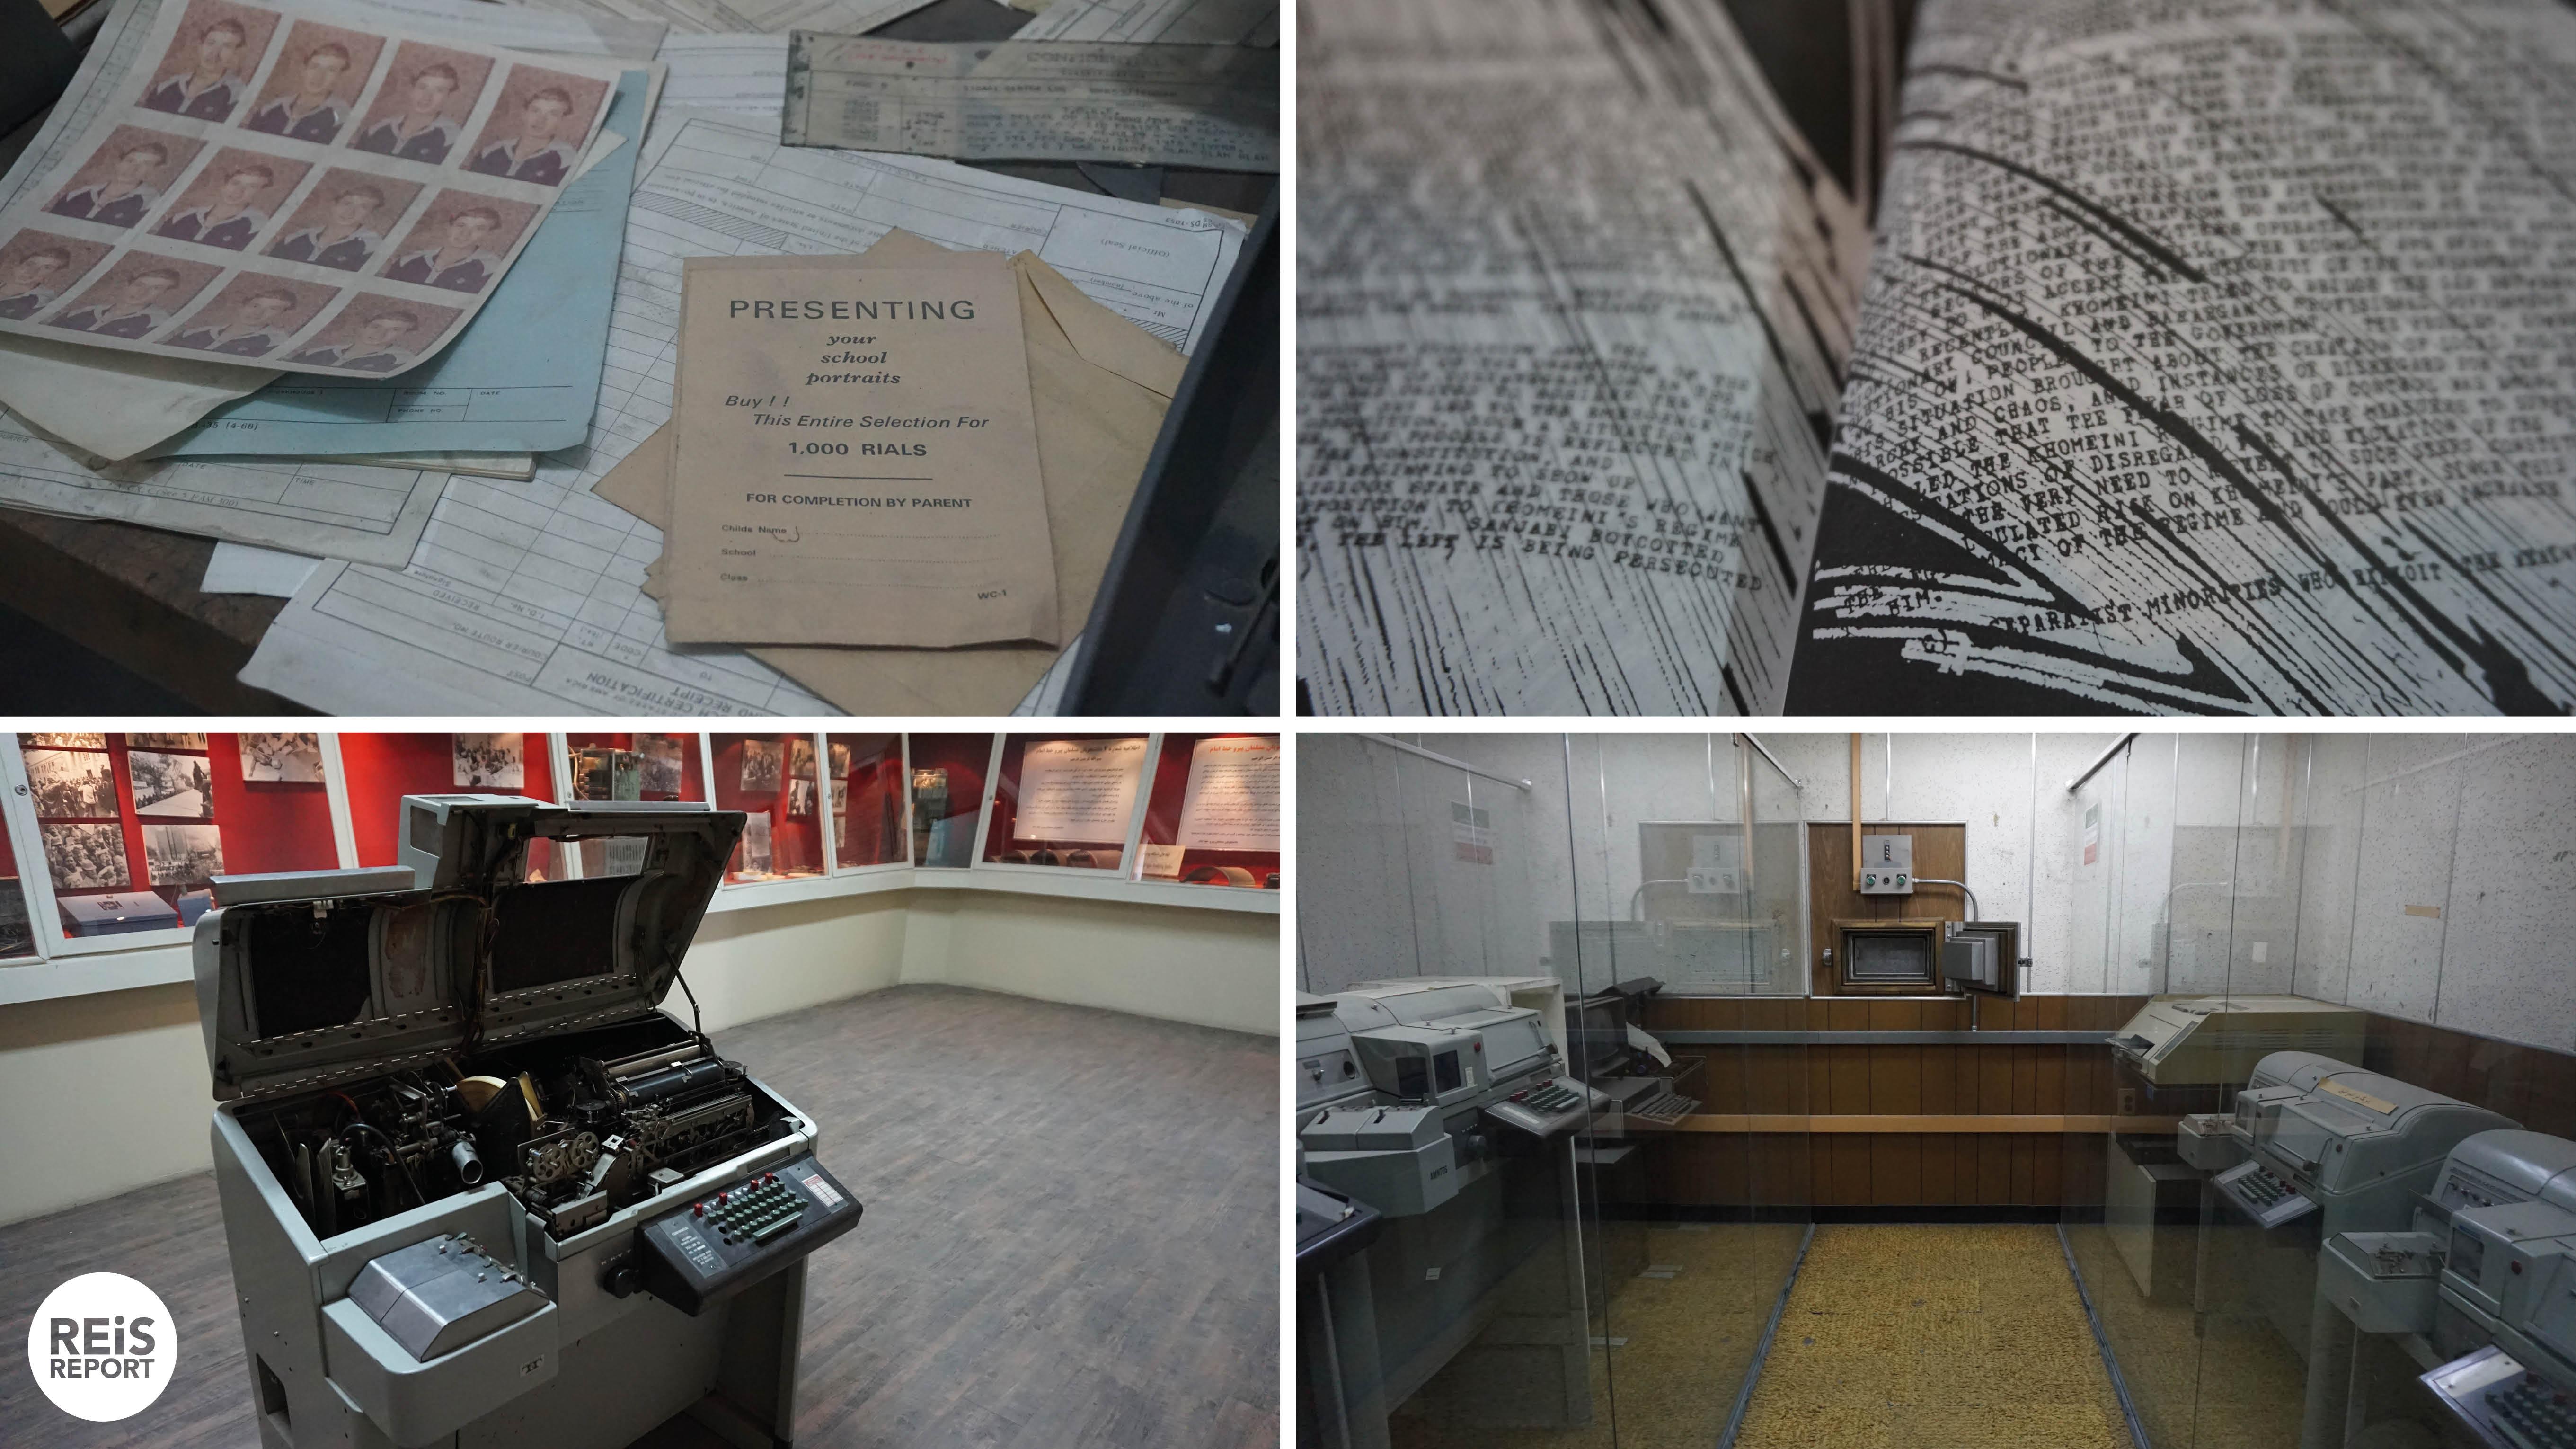 amerikaanse ambassade in teheran museum